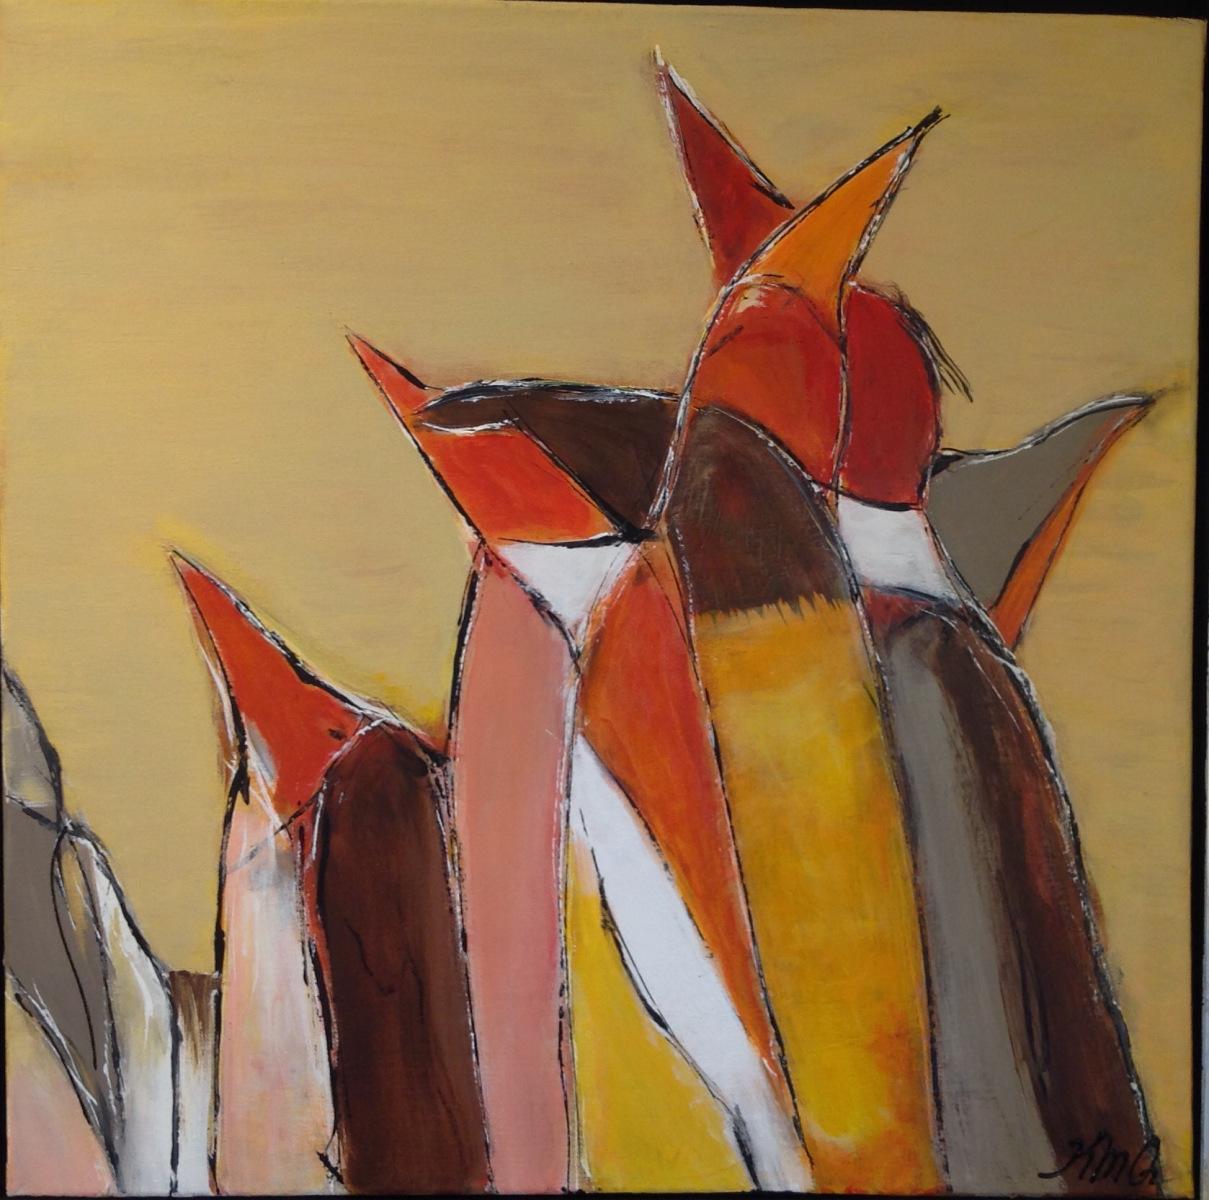 Pingviner 40 x40 cm solgt oktober 2020 fra Hotel Marina